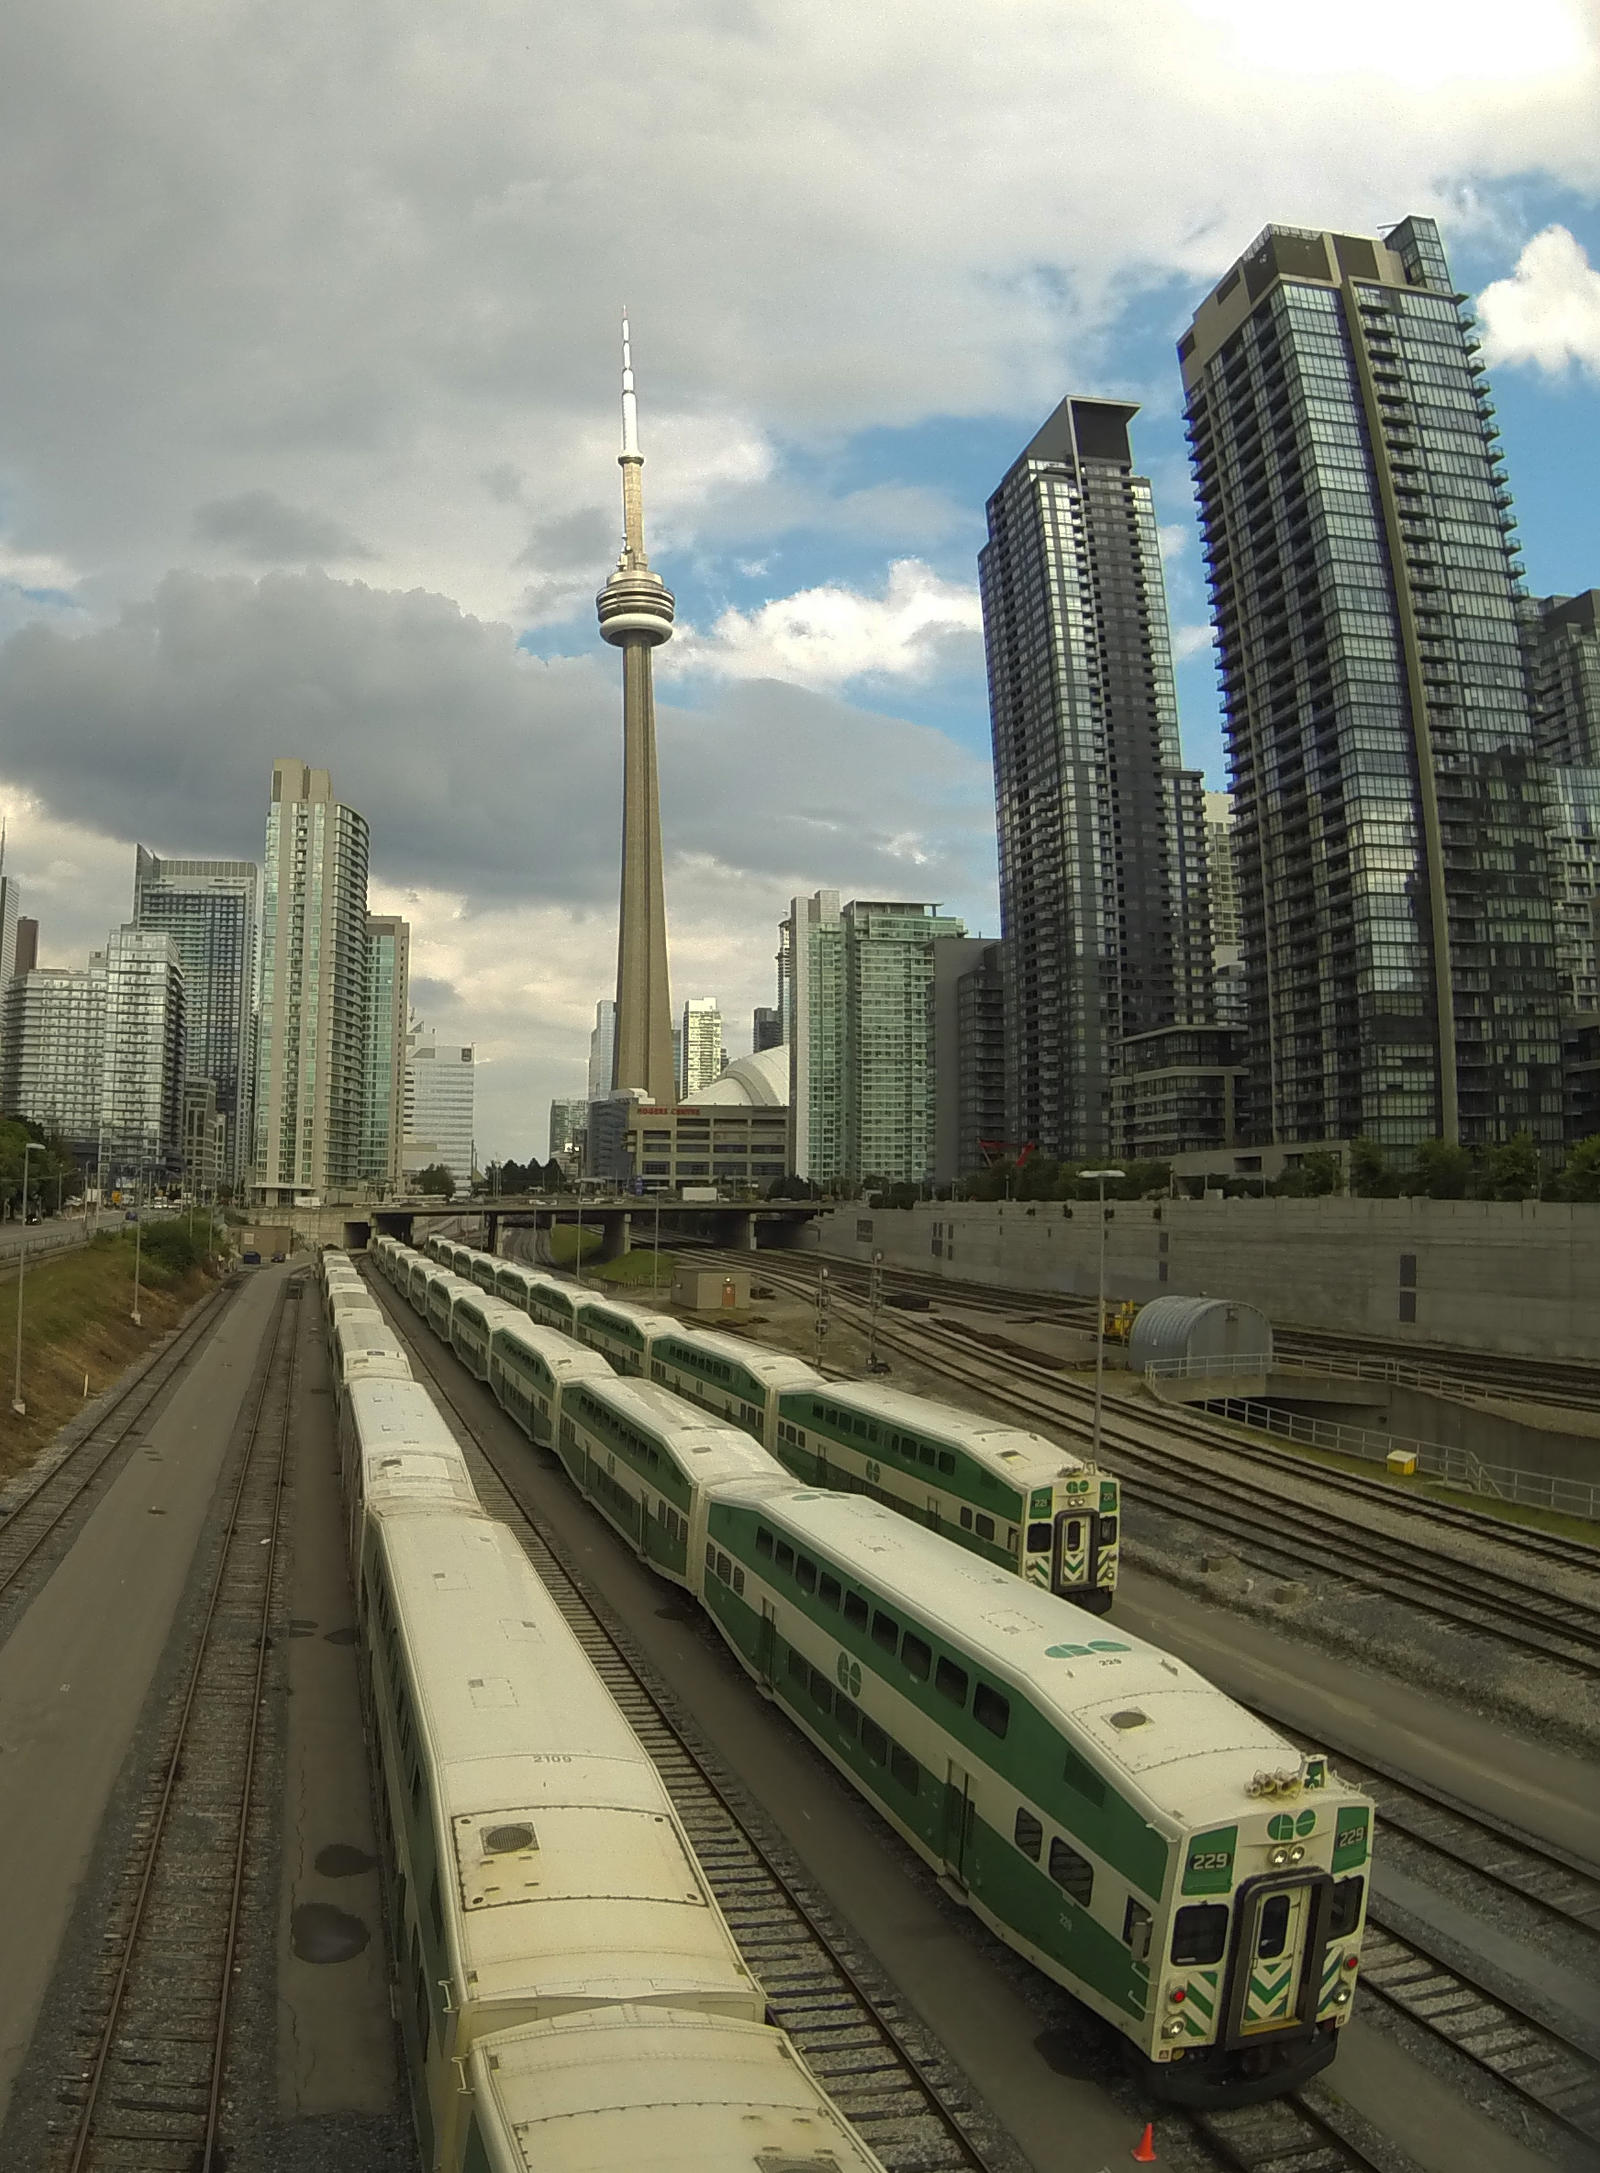 Toronto station